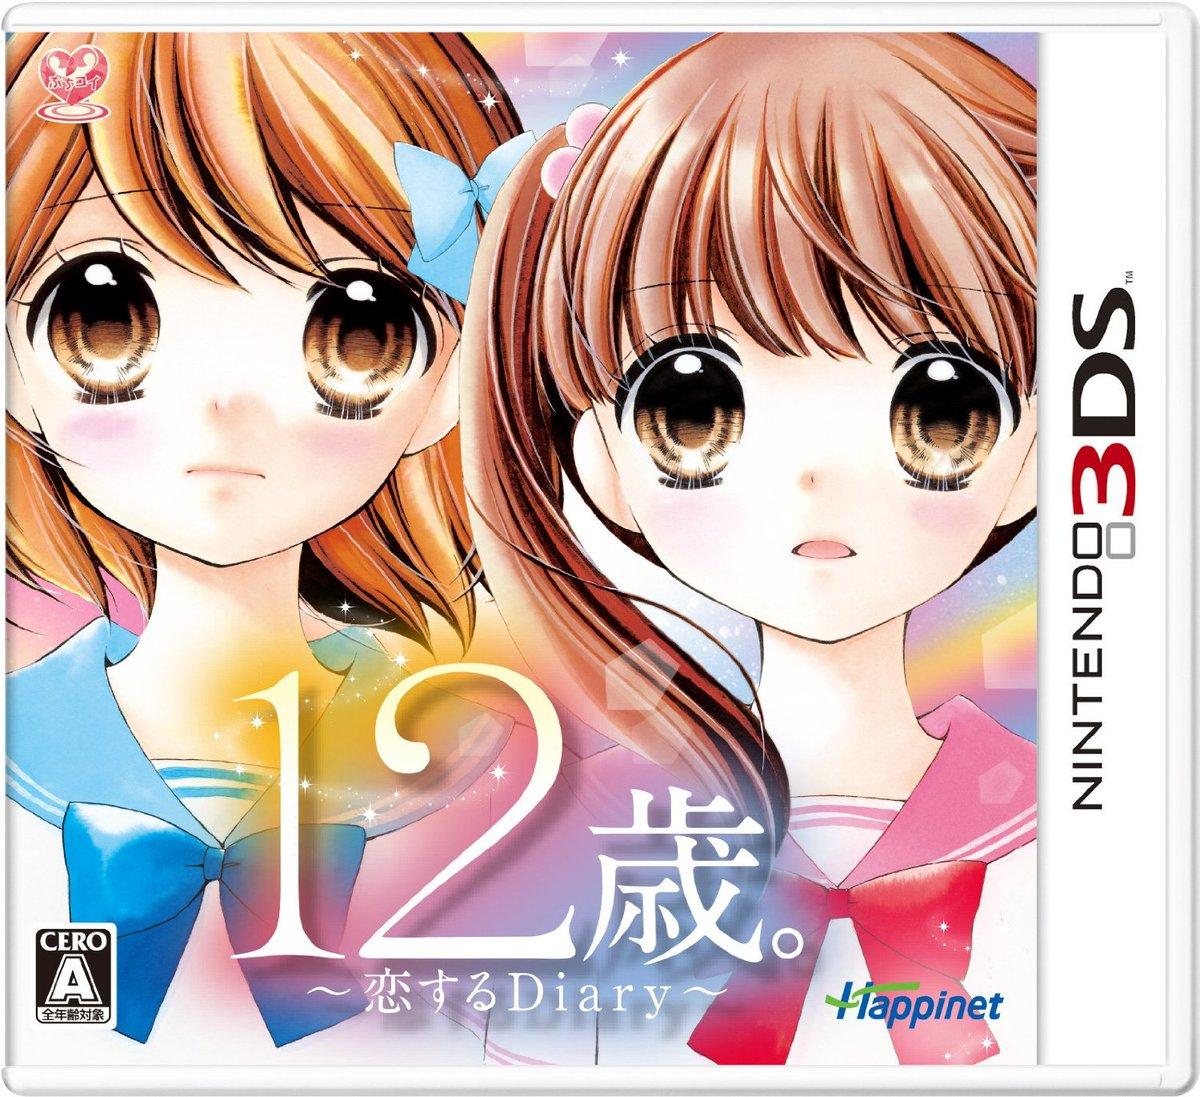 [3DS] 12세. ~사랑하는 Diary~ / 12歳。~恋するDiary~ / 2016년 8월 4일 발매 중!